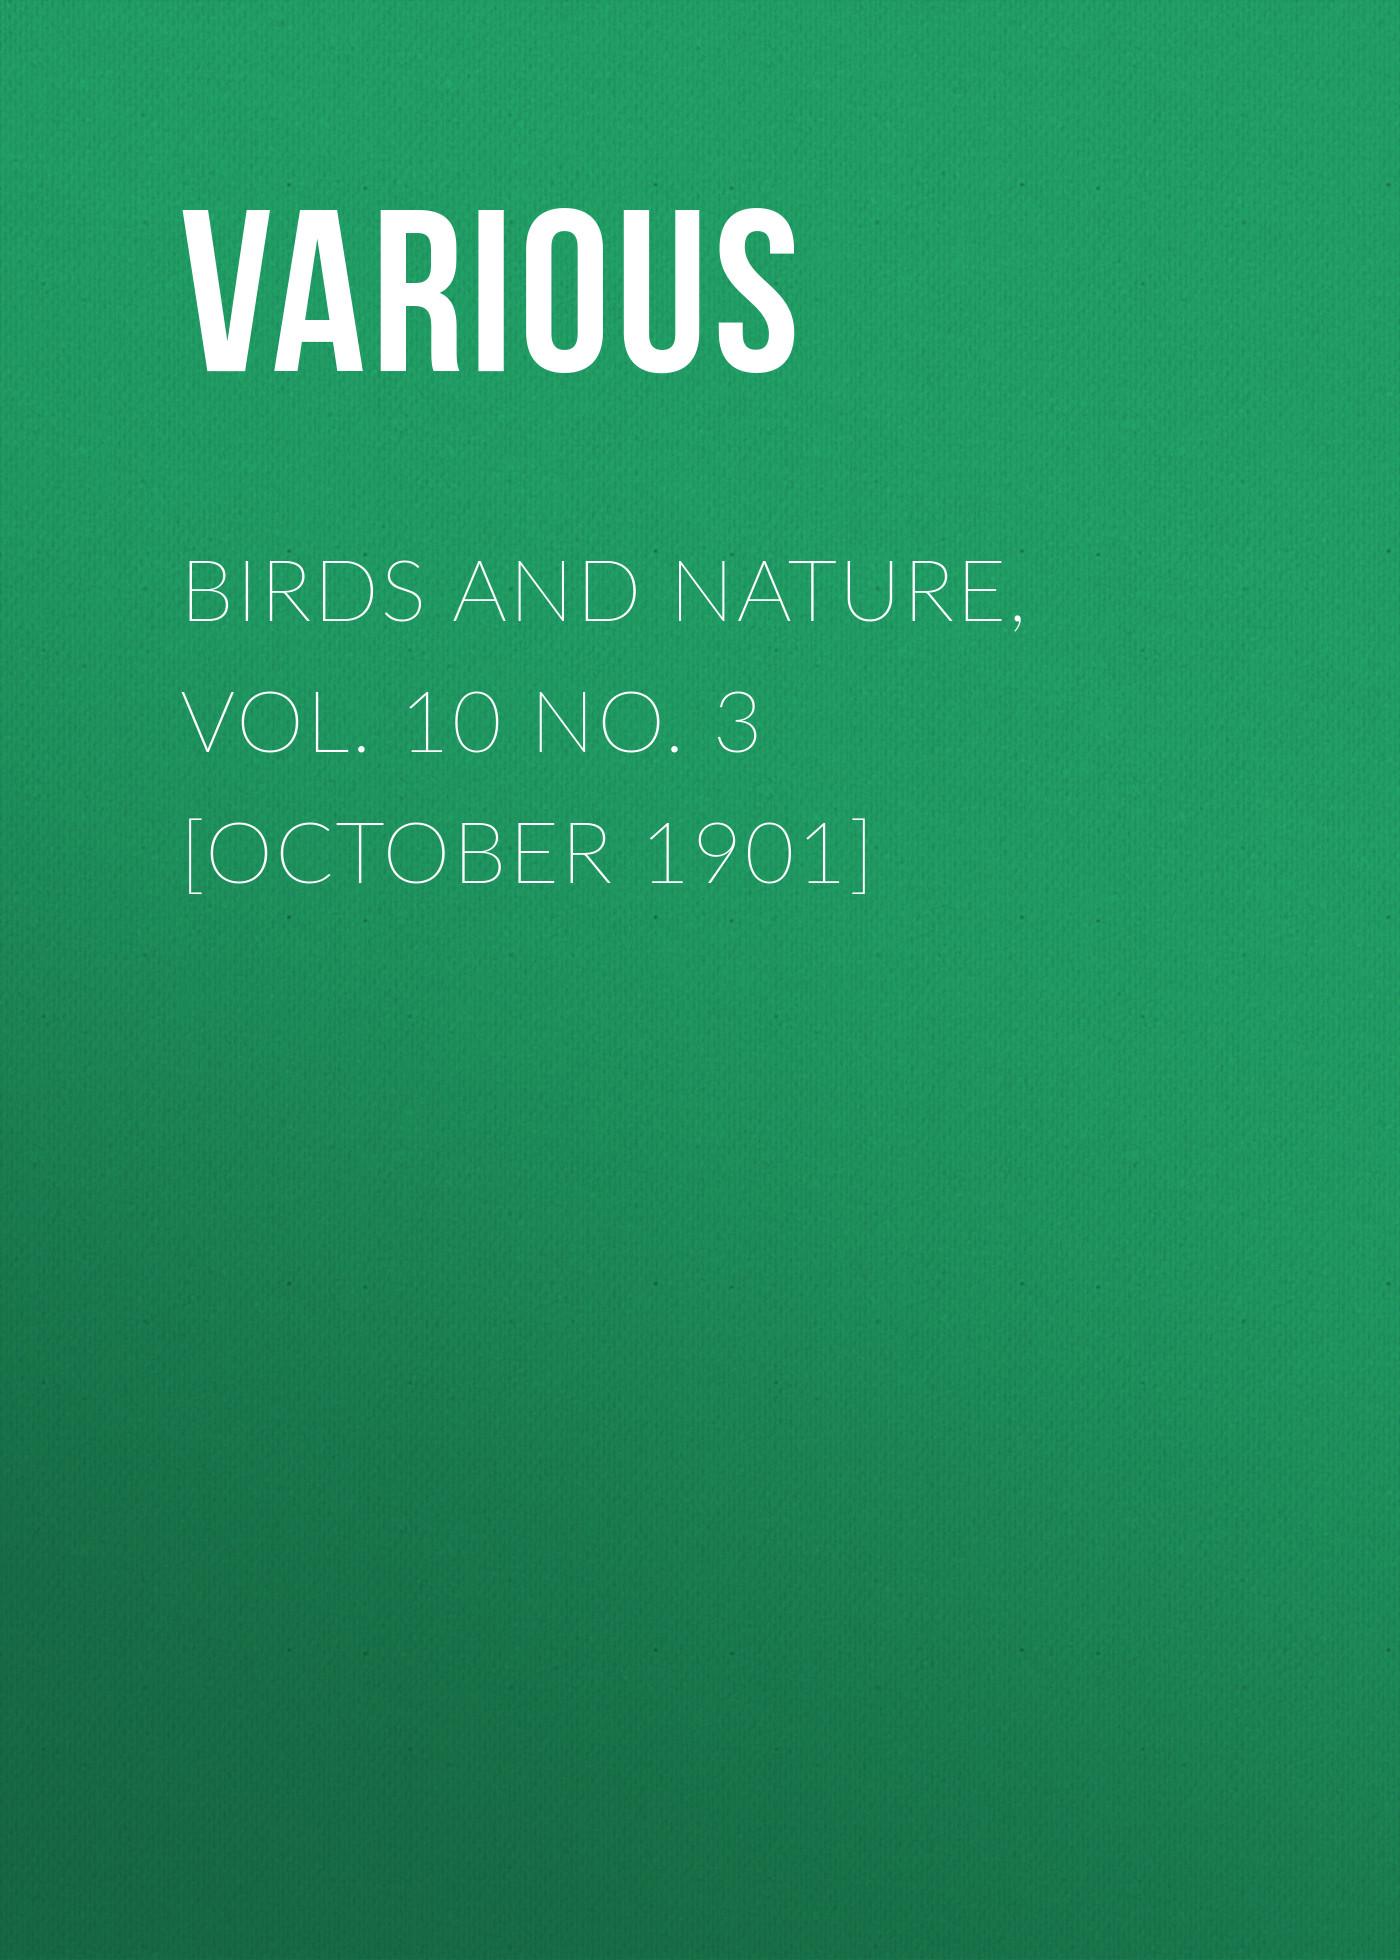 Various Birds and Nature, Vol. 10 No. 3 [October 1901]